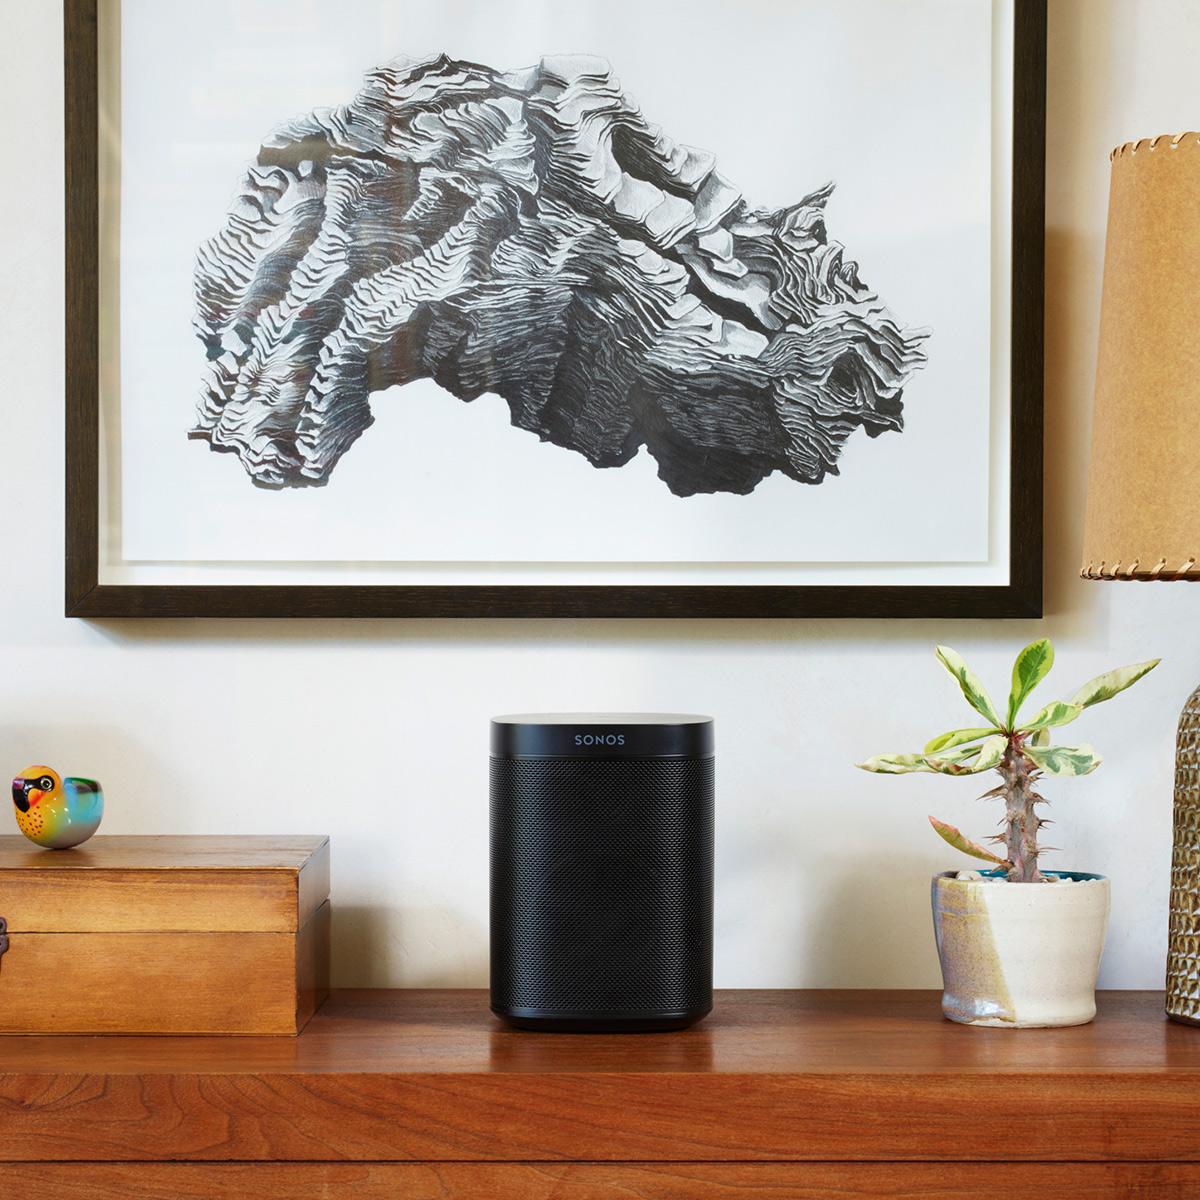 Sonos-One-Voice-Controlled-Wireless-Smart-Speaker-Gen-2 thumbnail 11